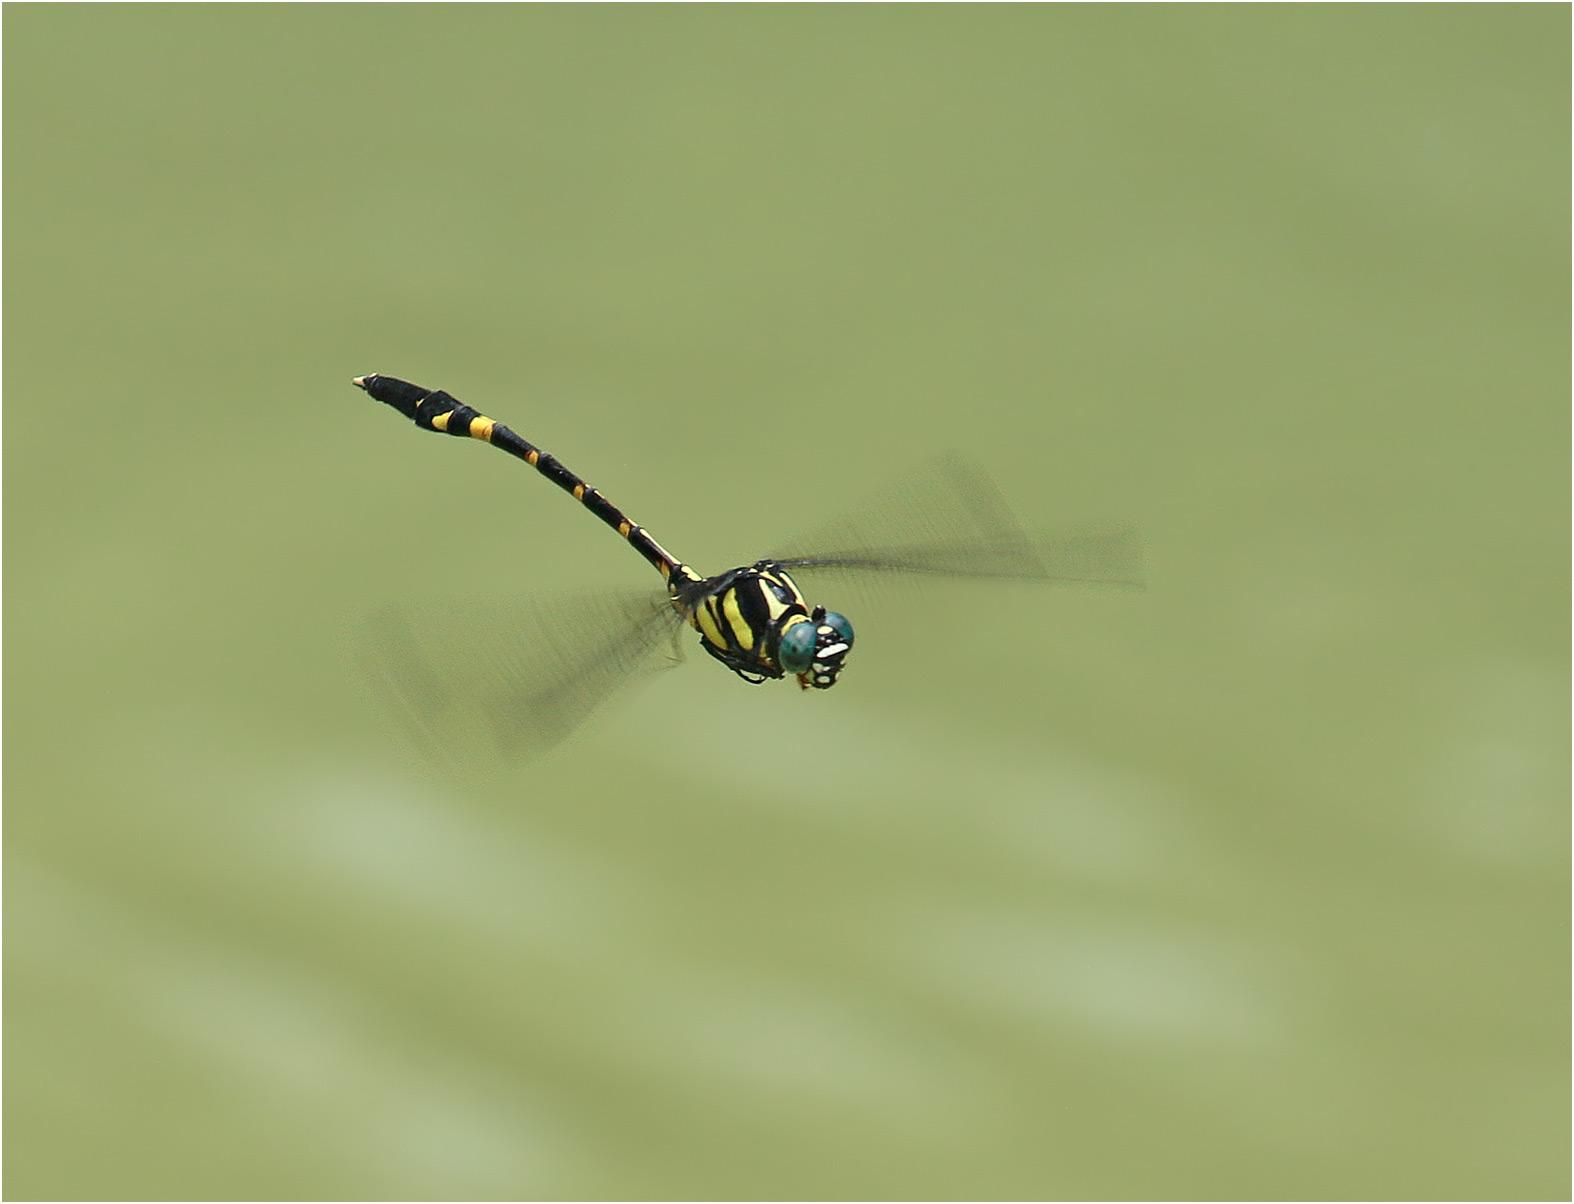 Macrogomphus guilinensis mâle, Vietnam, Huu Lien, 03/06/2018